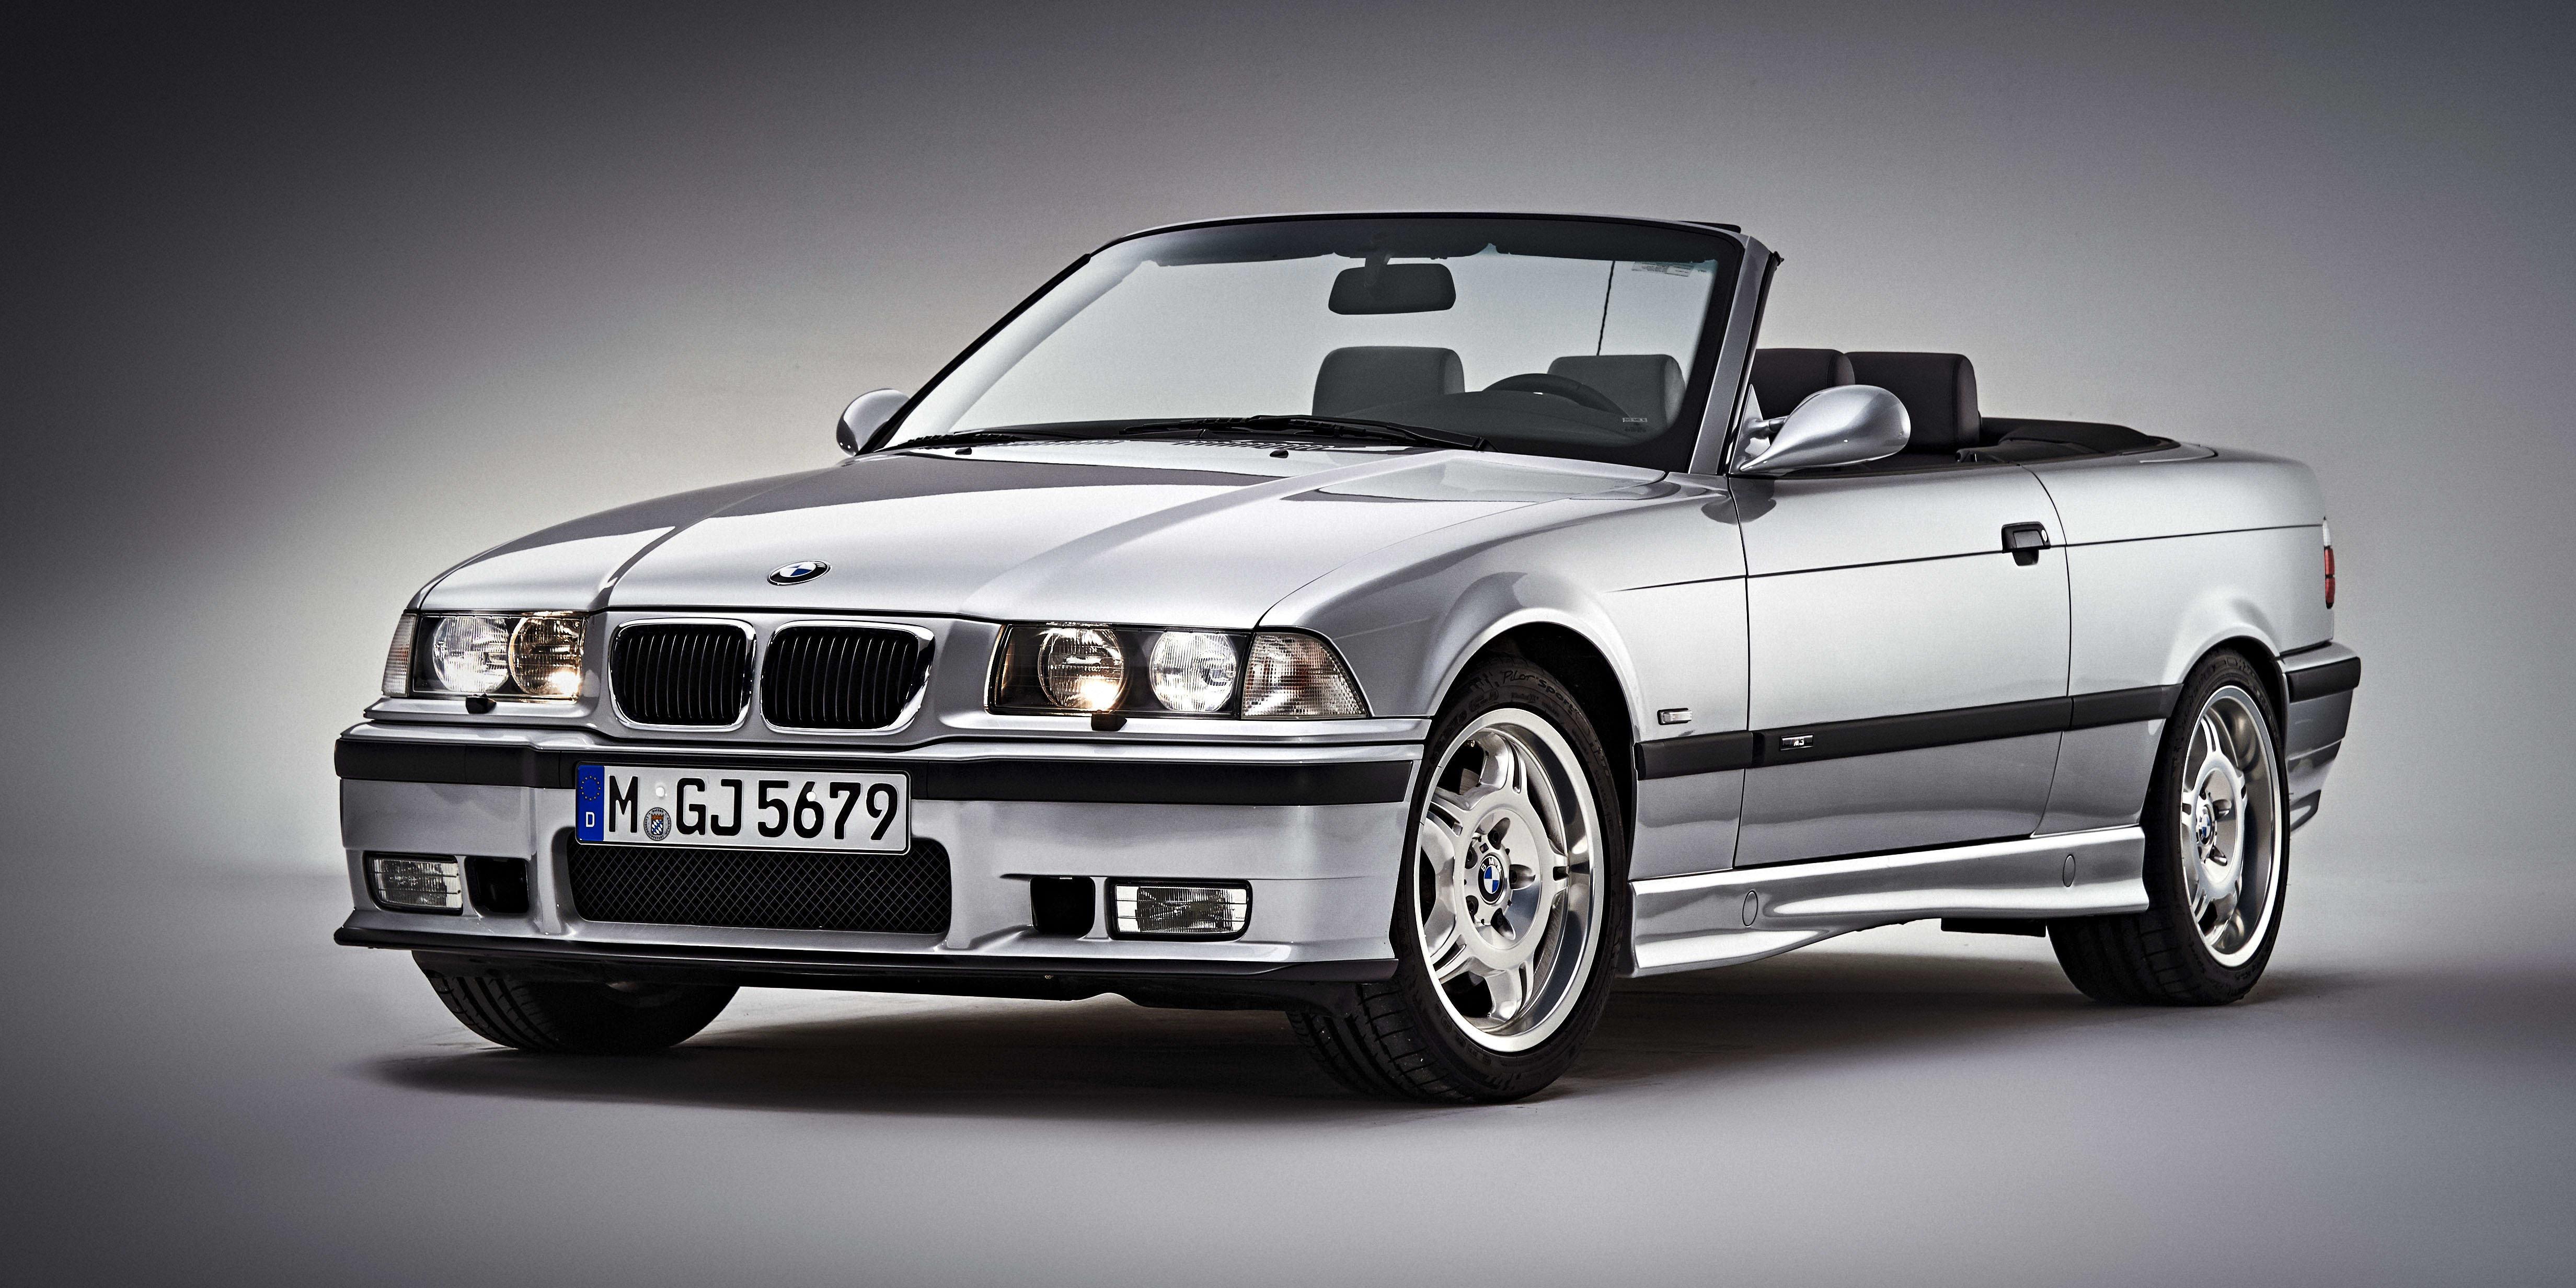 E36 BMW m3 convertible 1